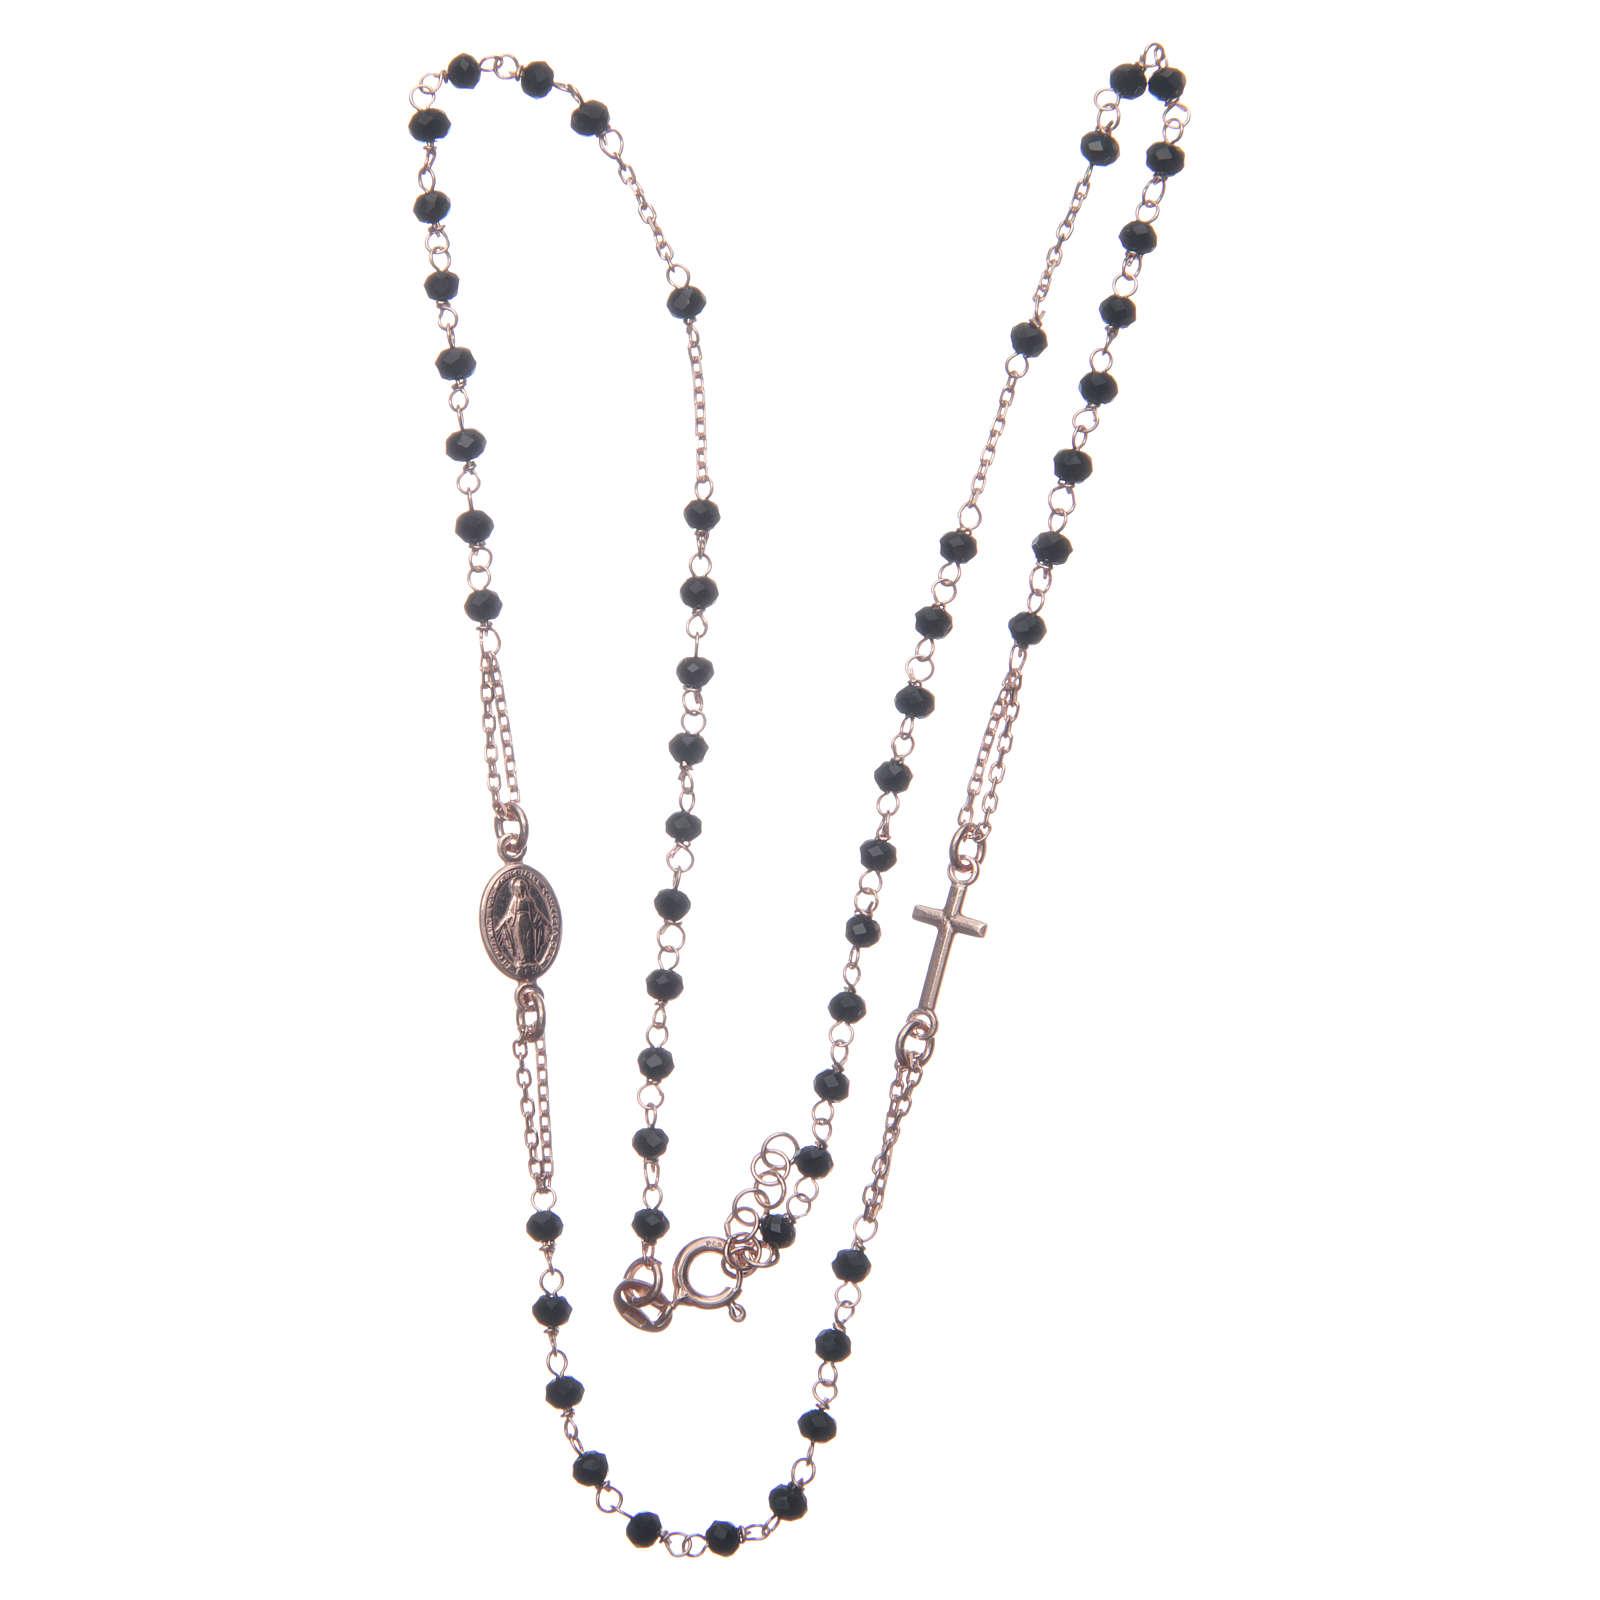 Rosario girocollo colore rosé e nero argento 925 4